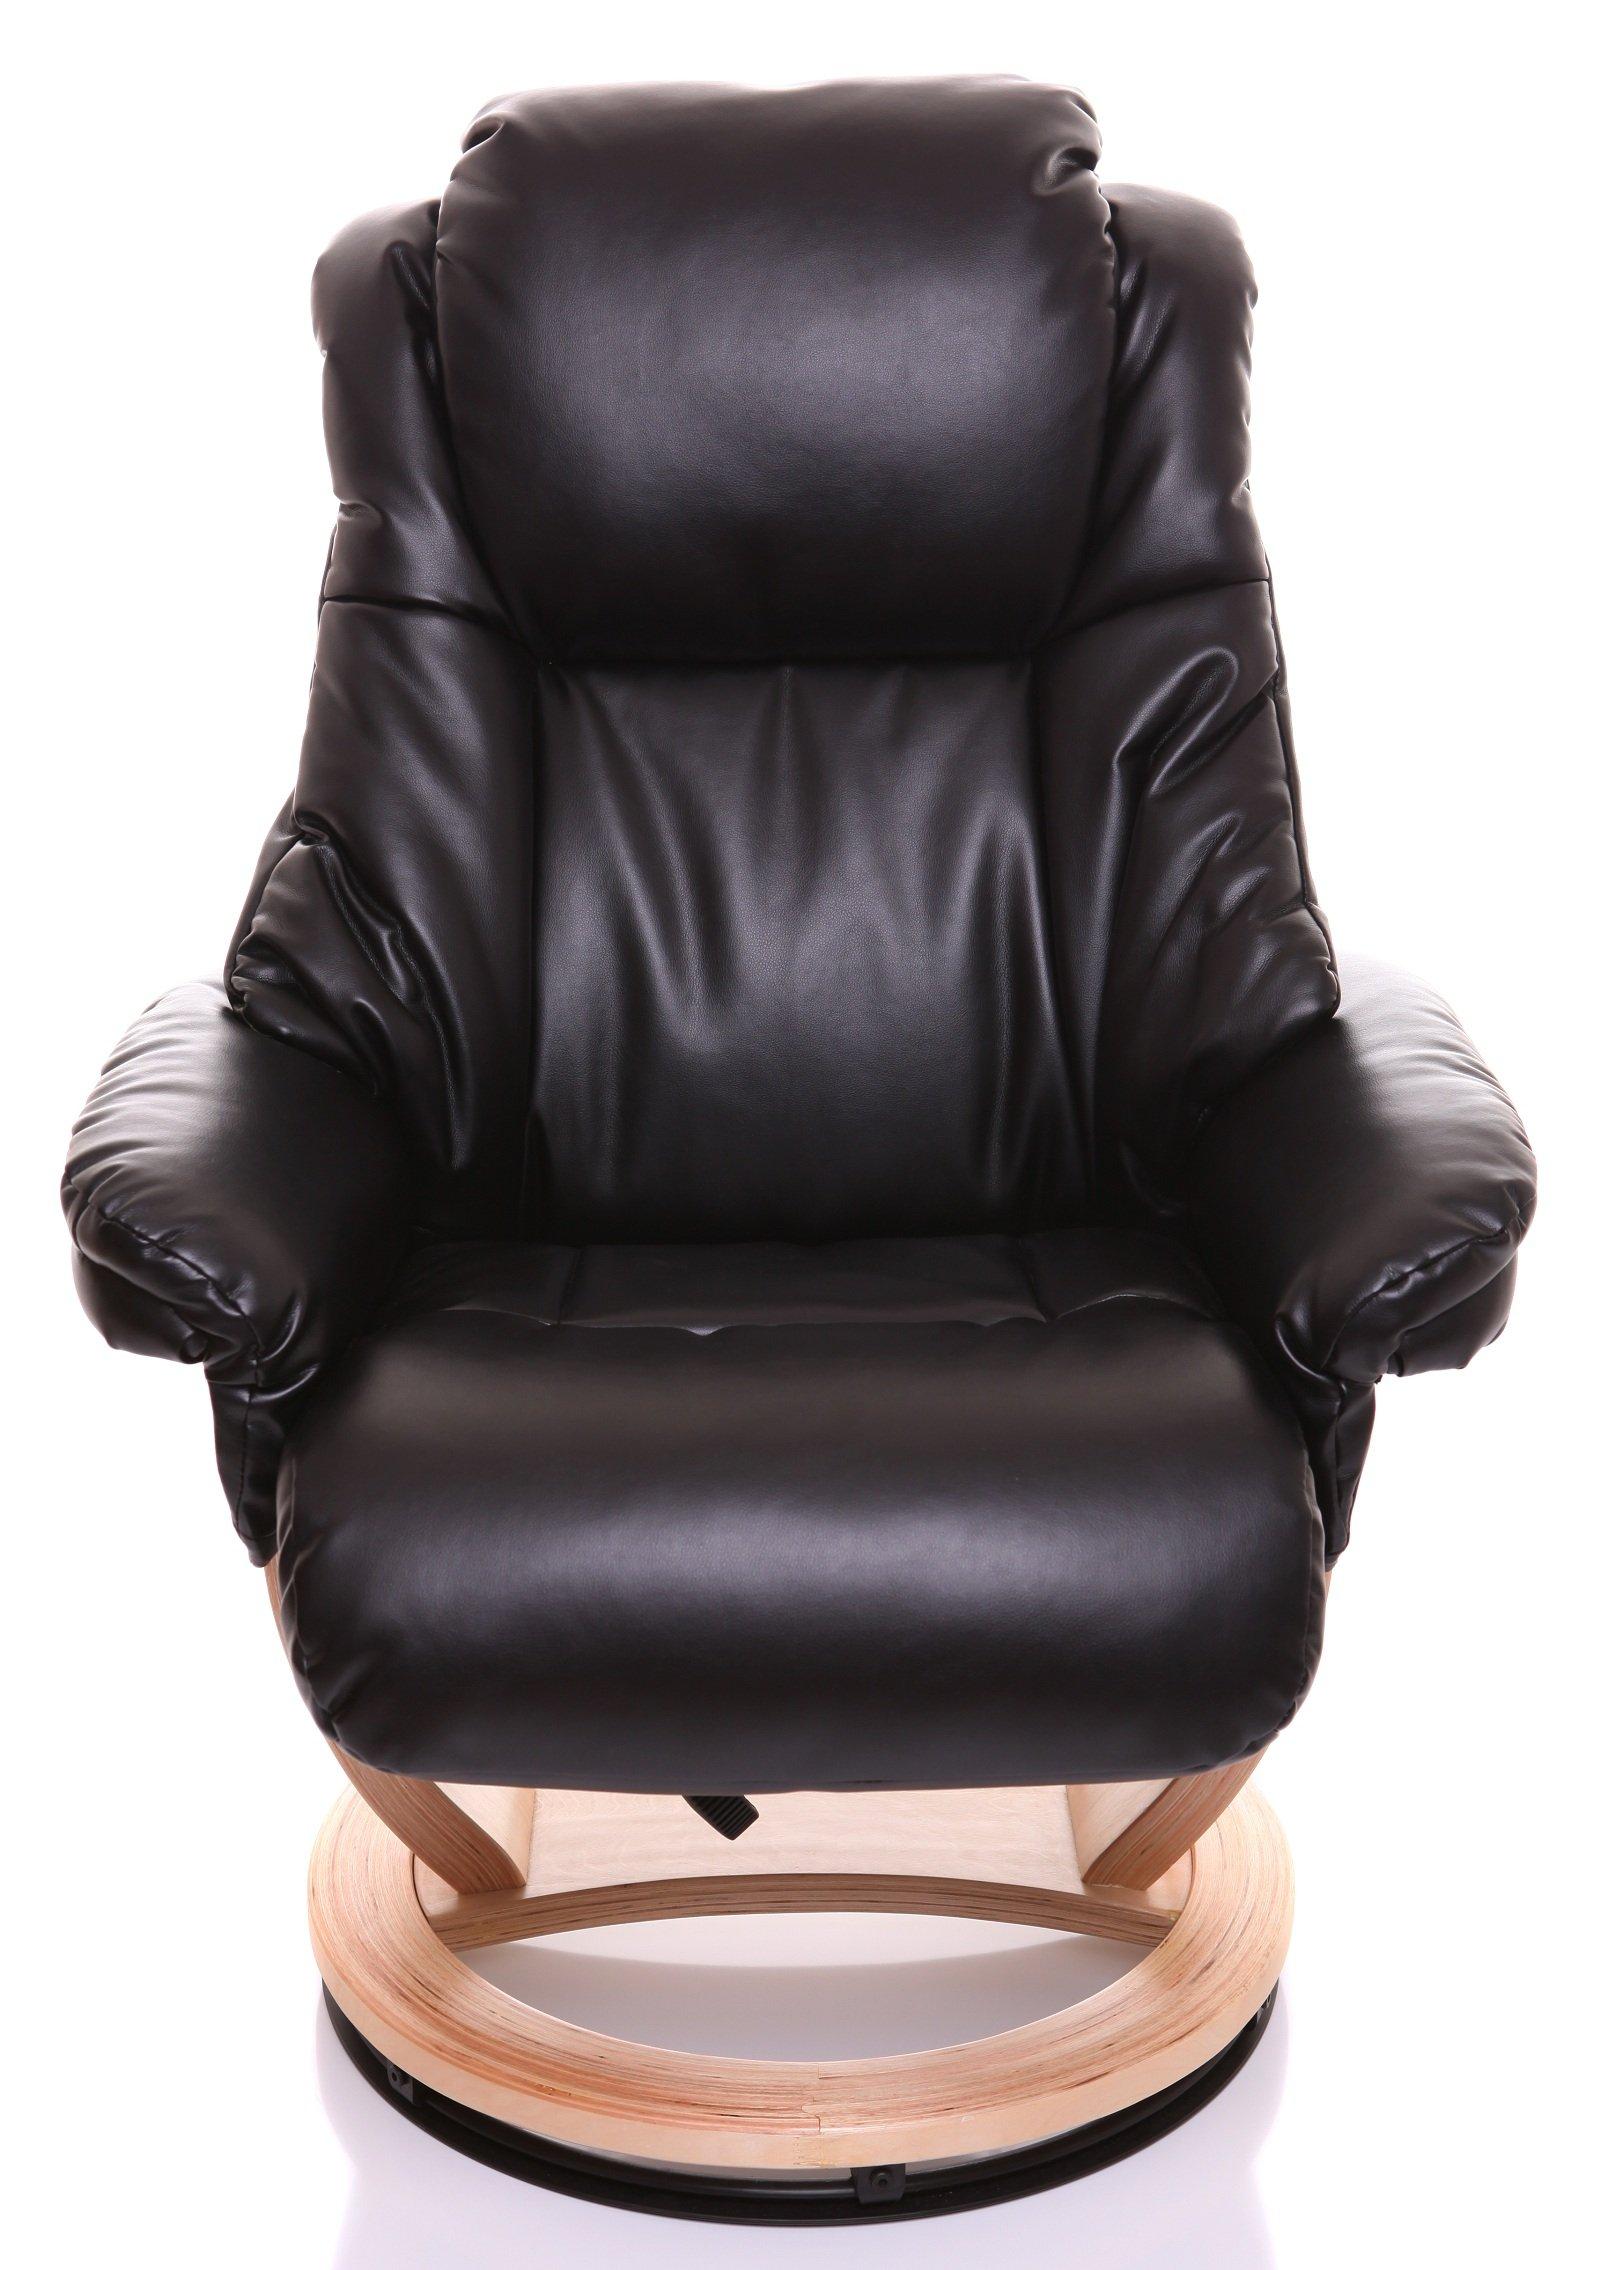 The Mars Premium Genuine Leather Swivel Recliner Chair